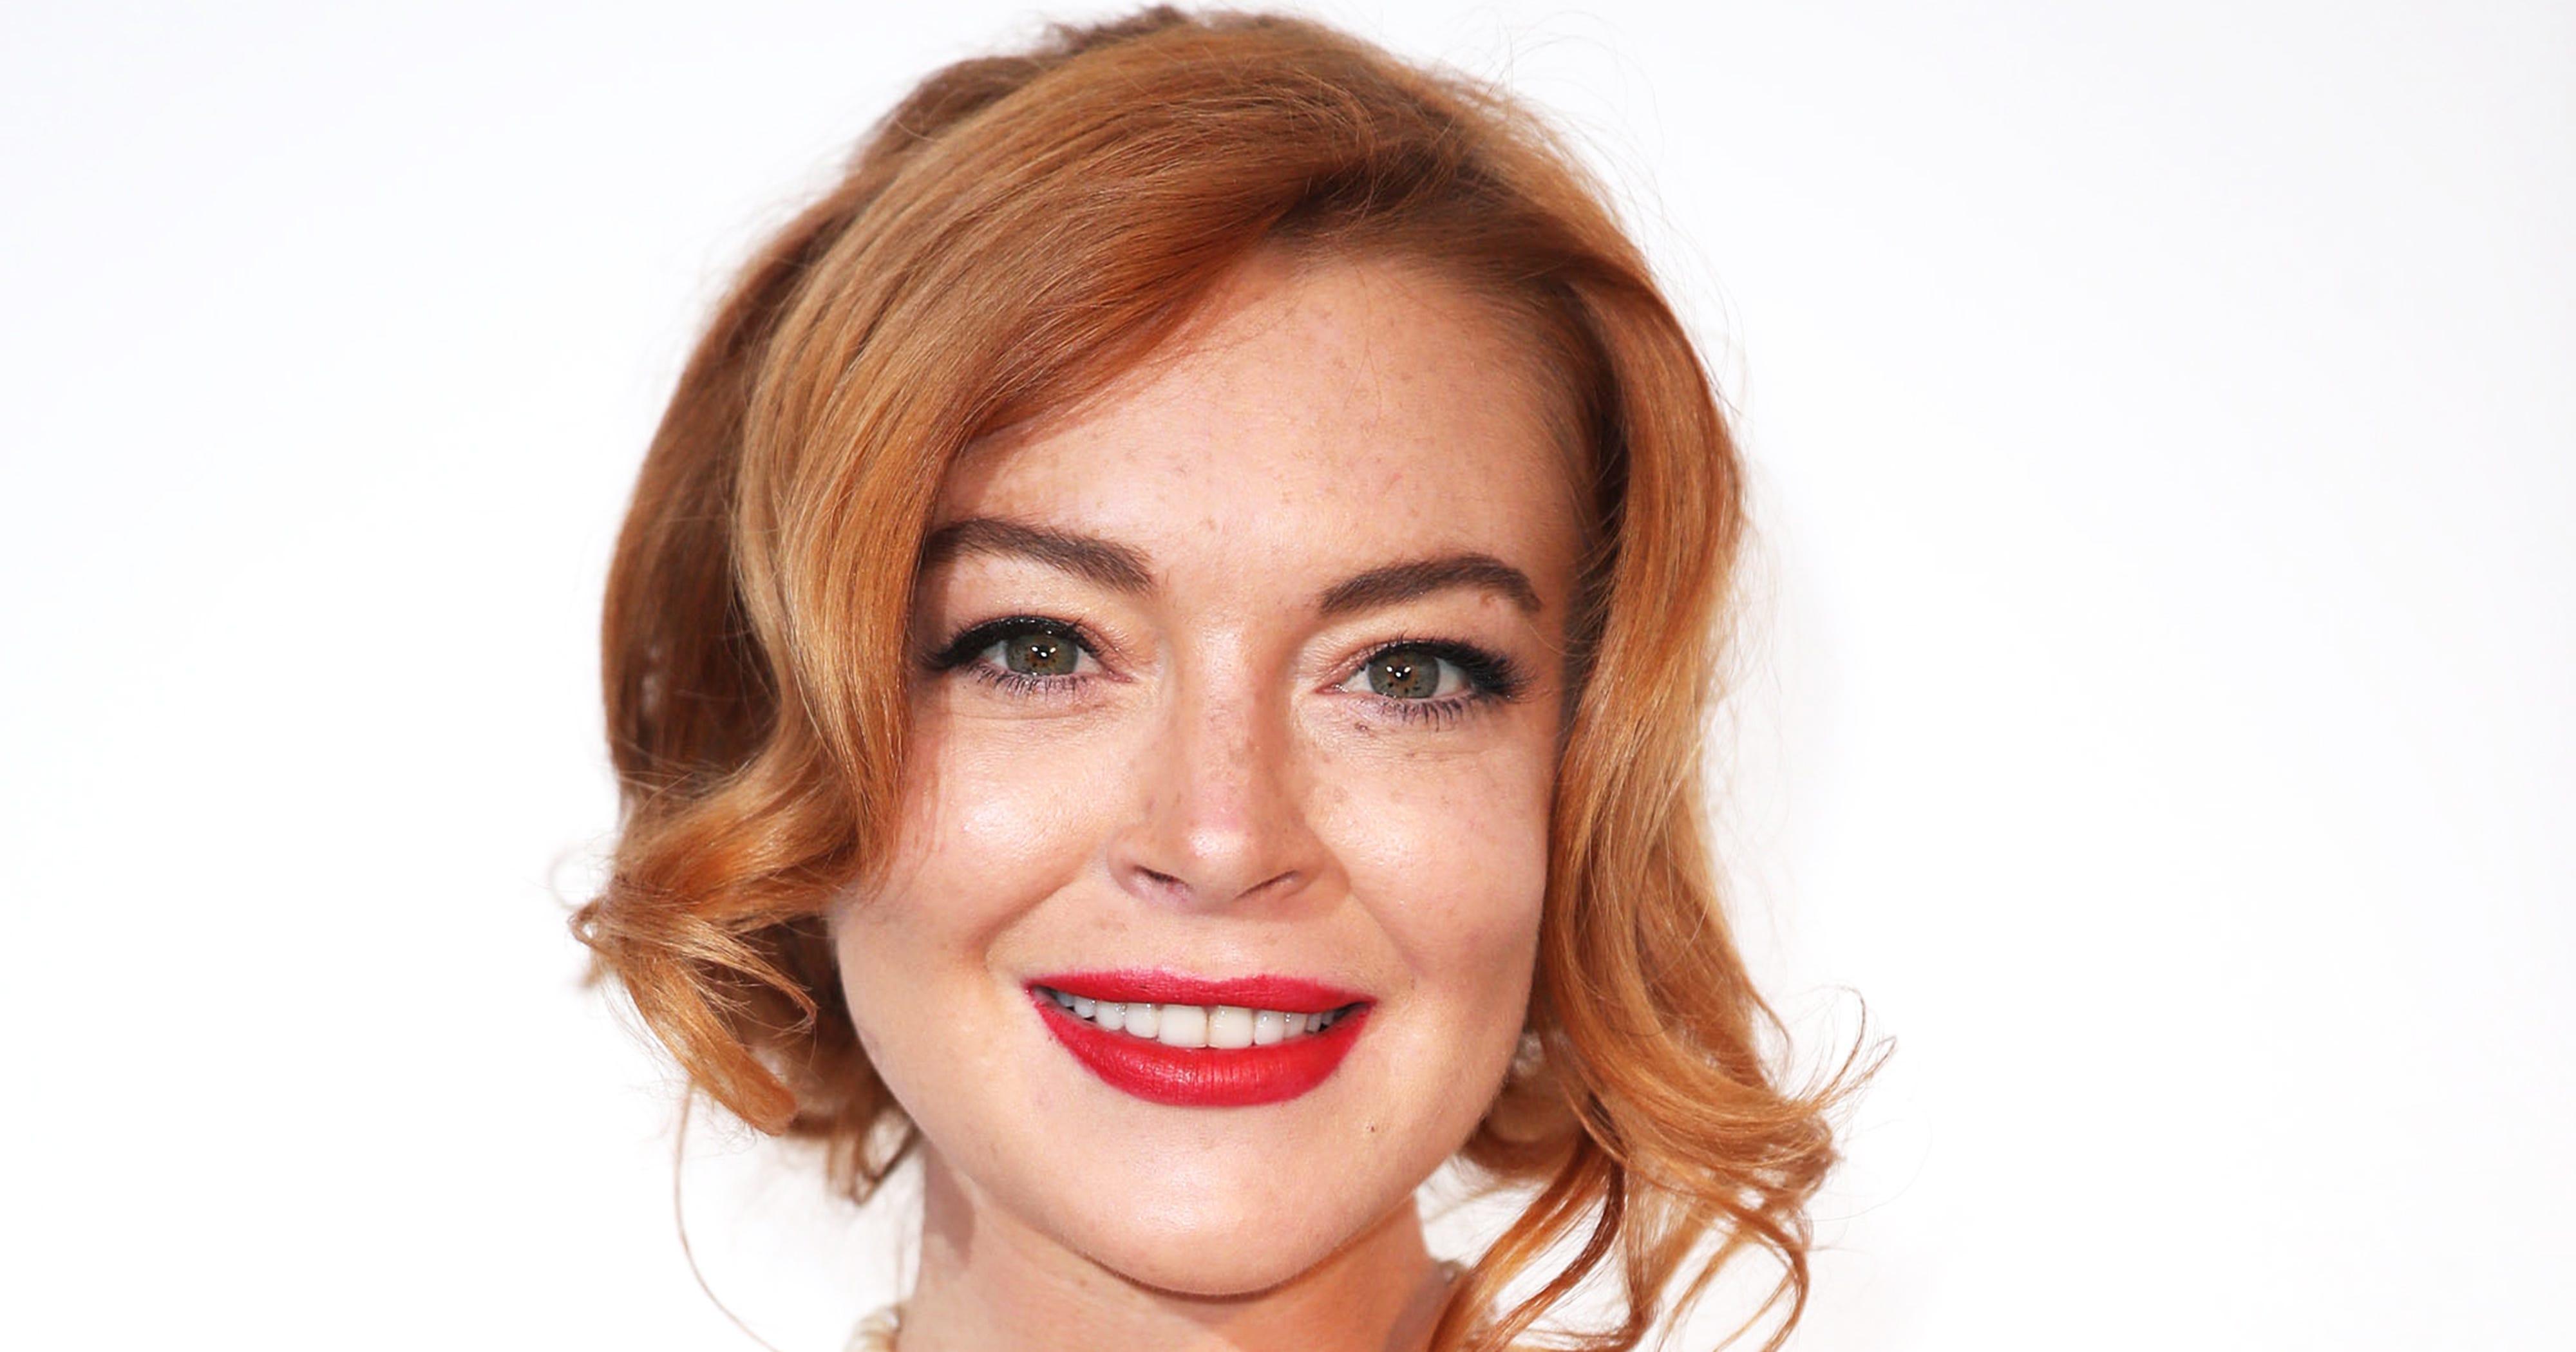 Lindsay Lohan Shows Off Her Tattoo Skills On Instagram